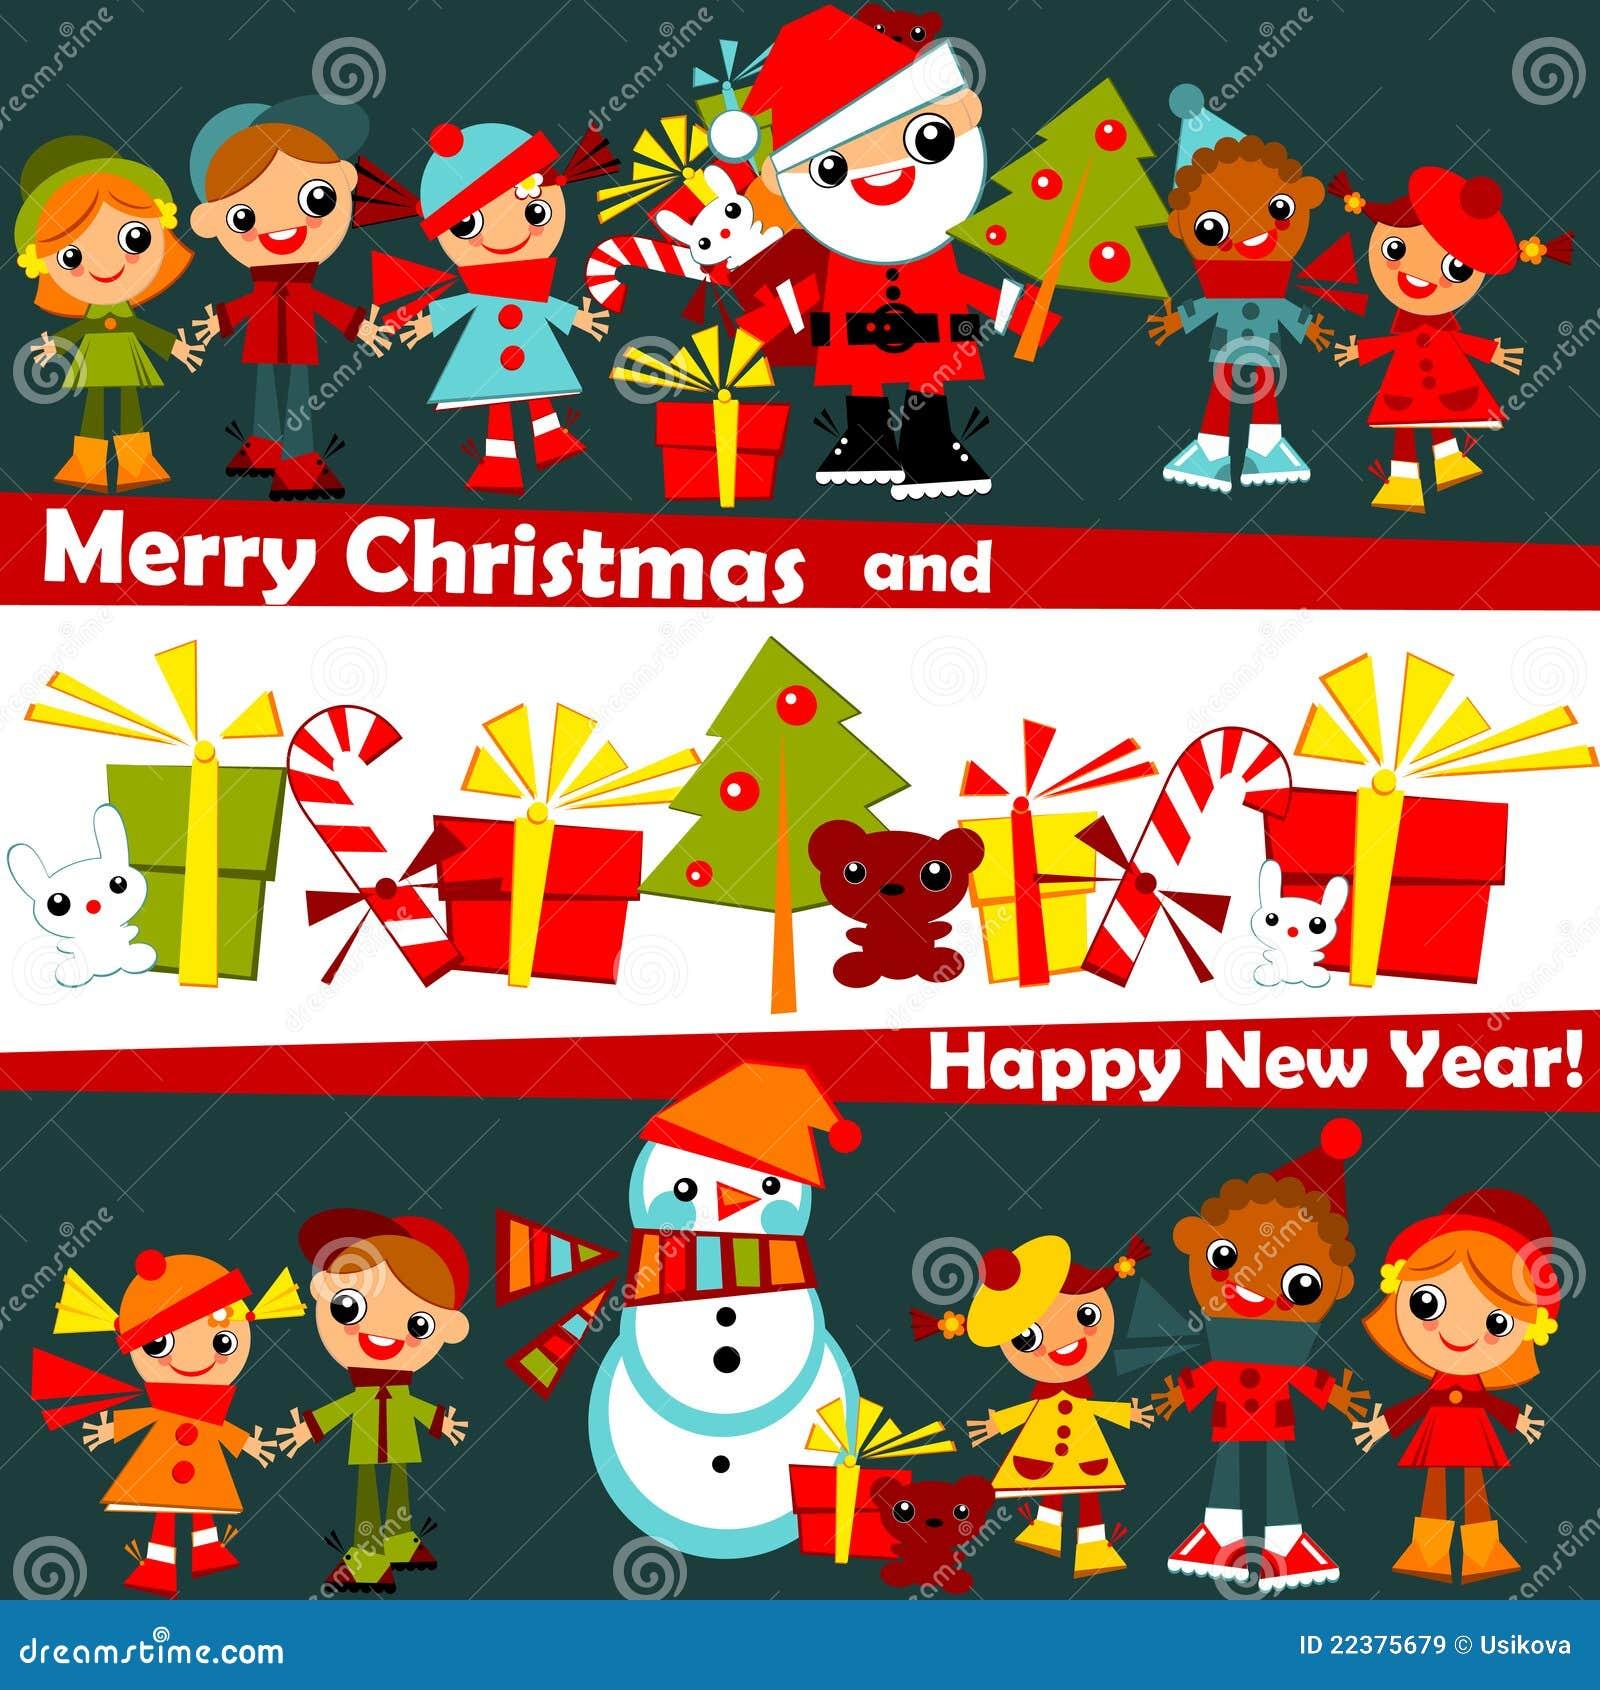 Kids Christmas background stock vector. Illustration of card - 22375679